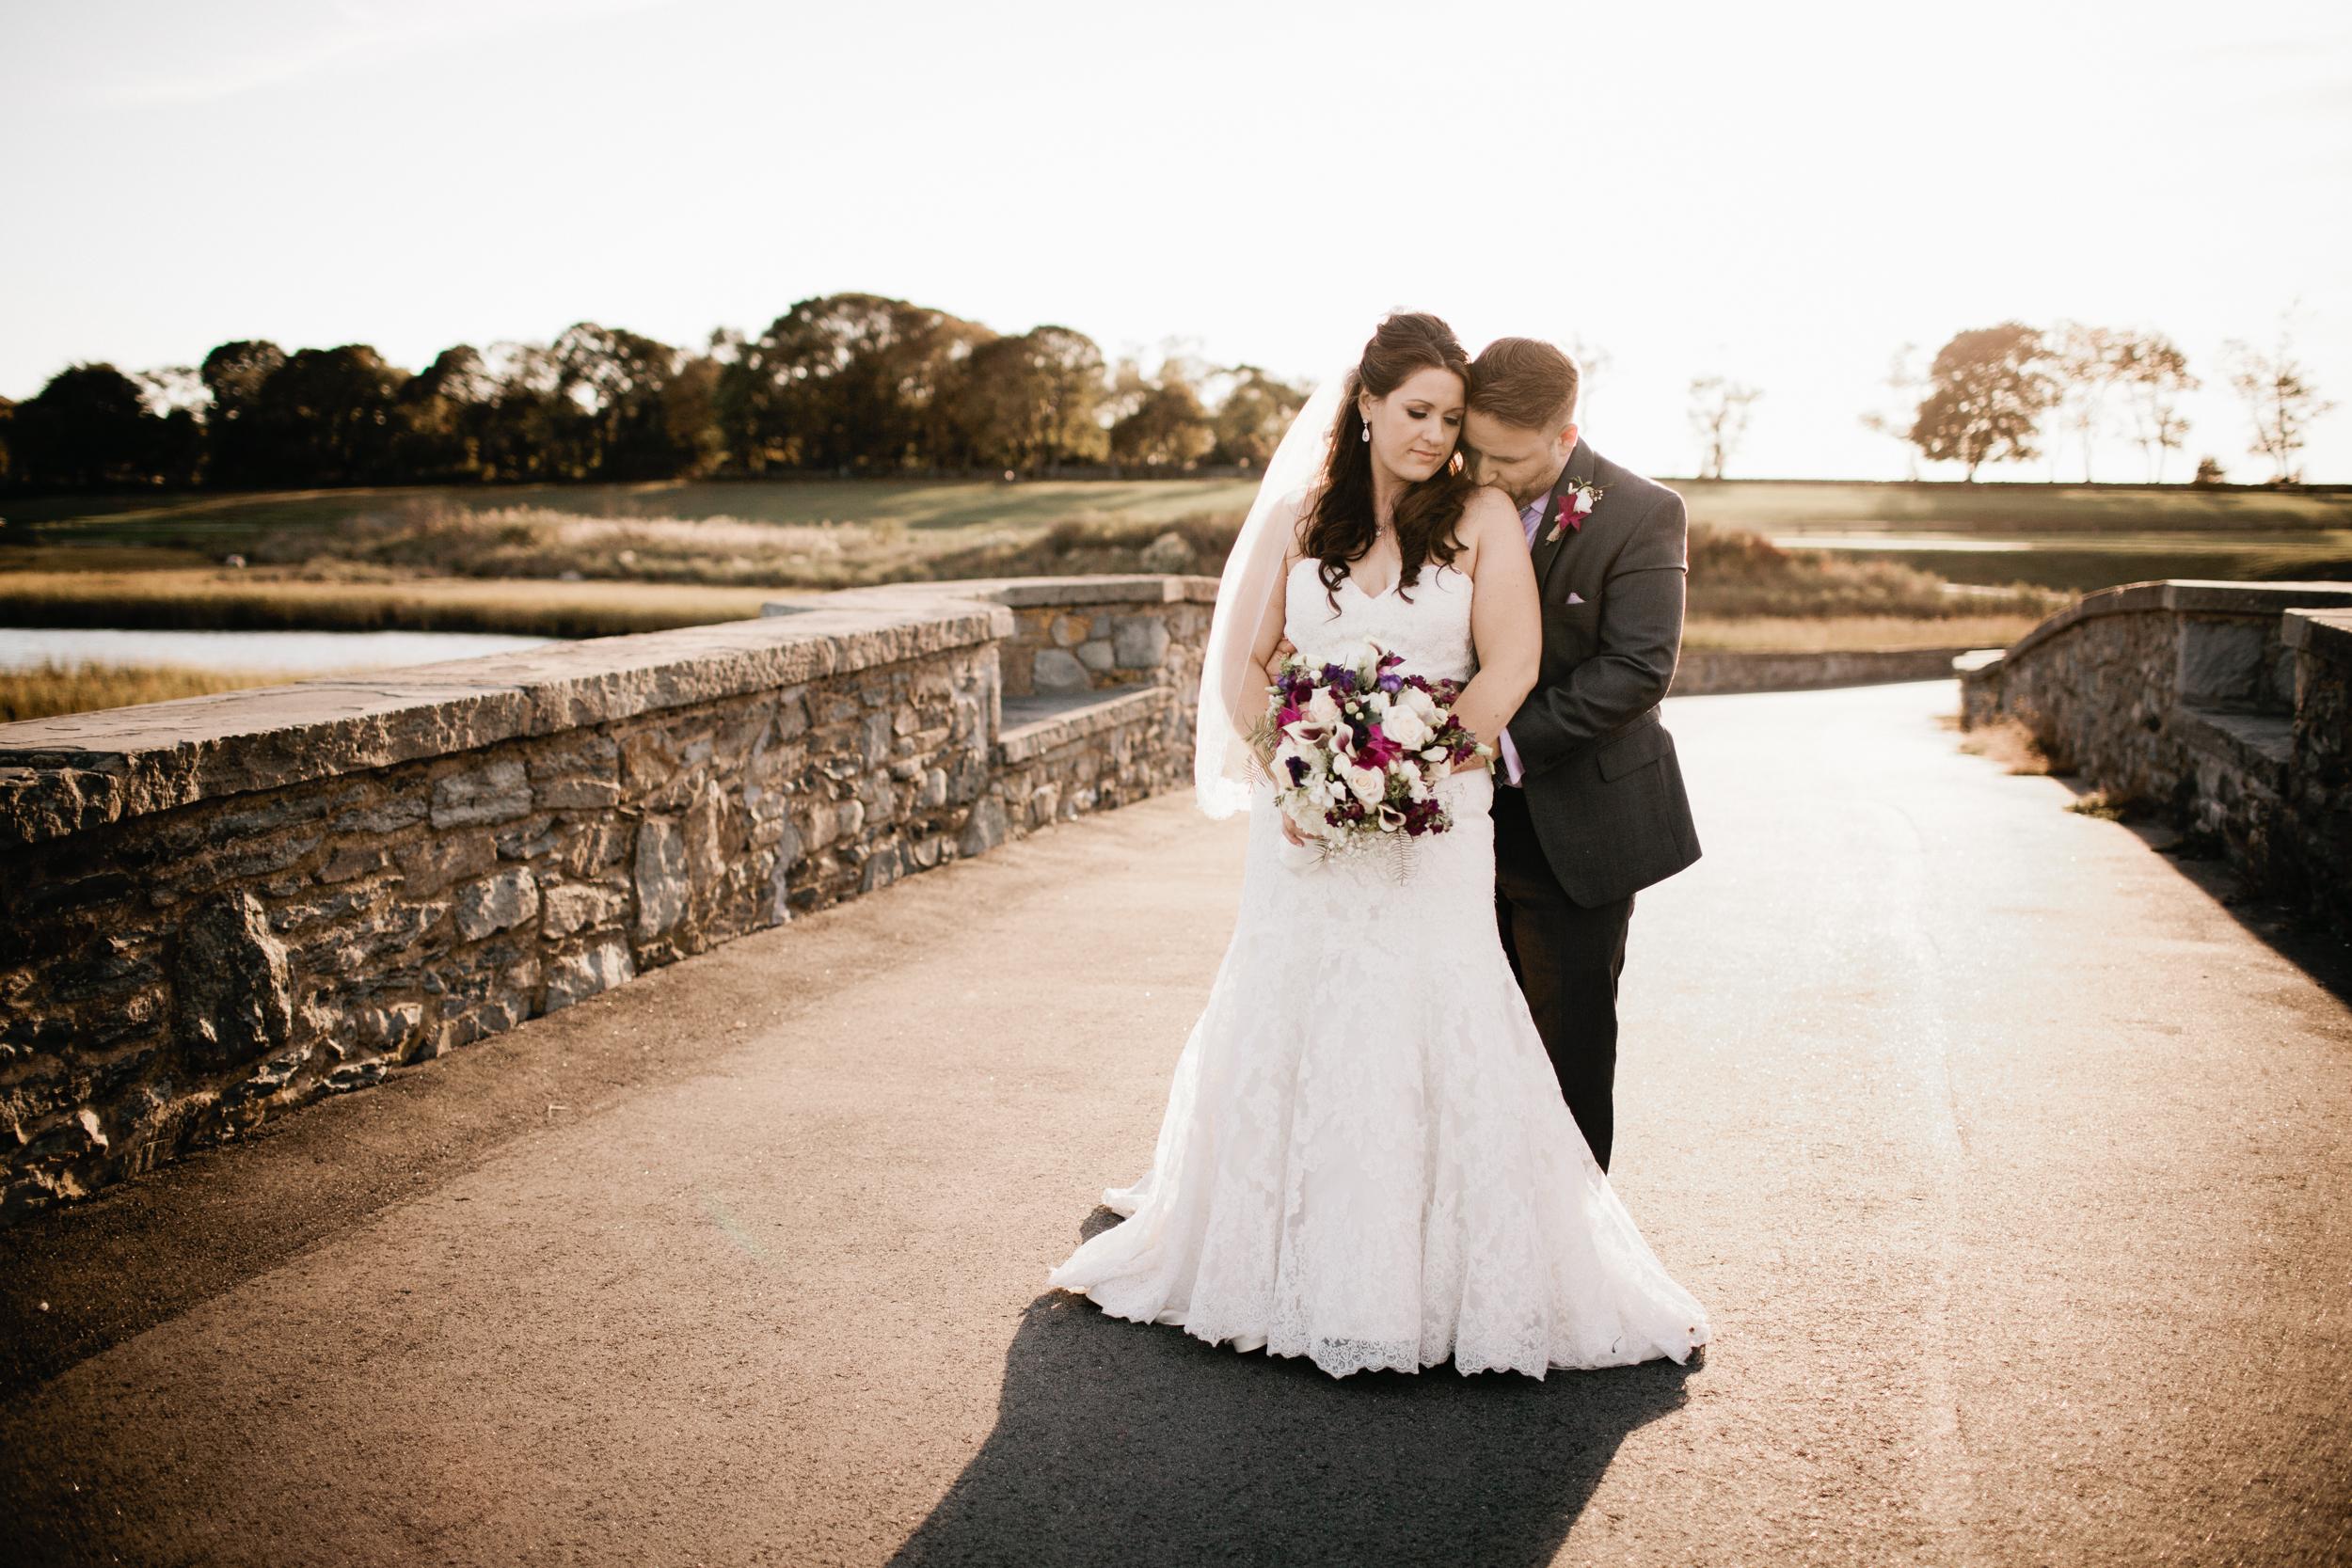 Mount-Hope-Farm-Wedding-88.jpg